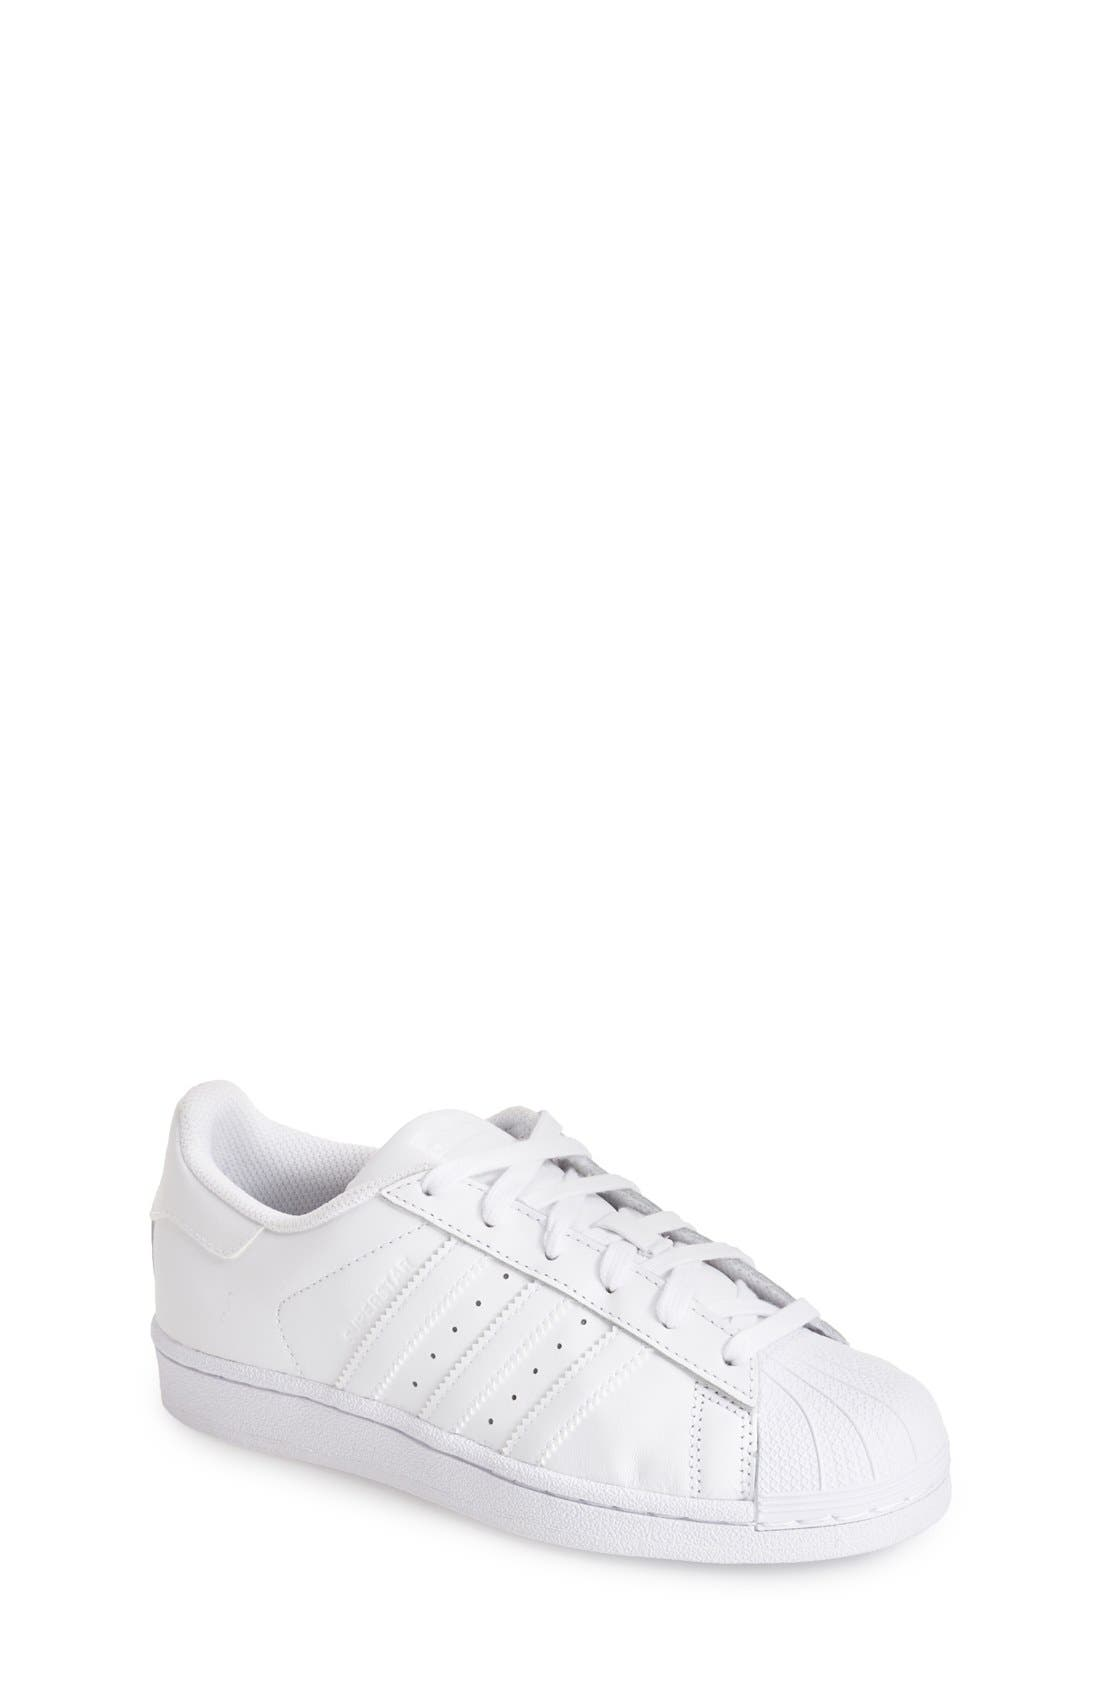 'Superstar 2' Sneaker,                         Main,                         color, 100